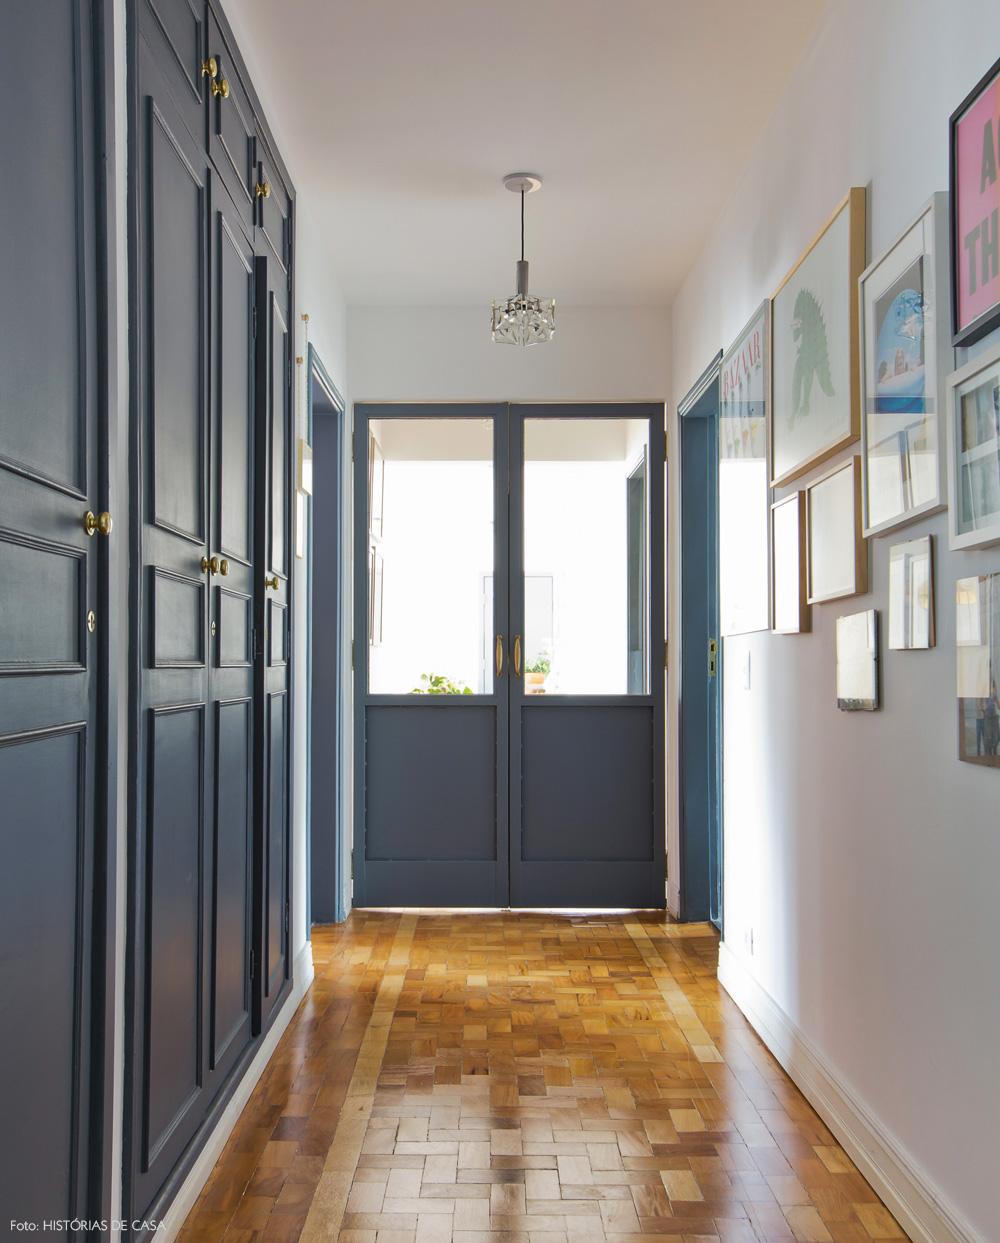 31-decoracao-corredor-armarios-pintados-cinza-tacos